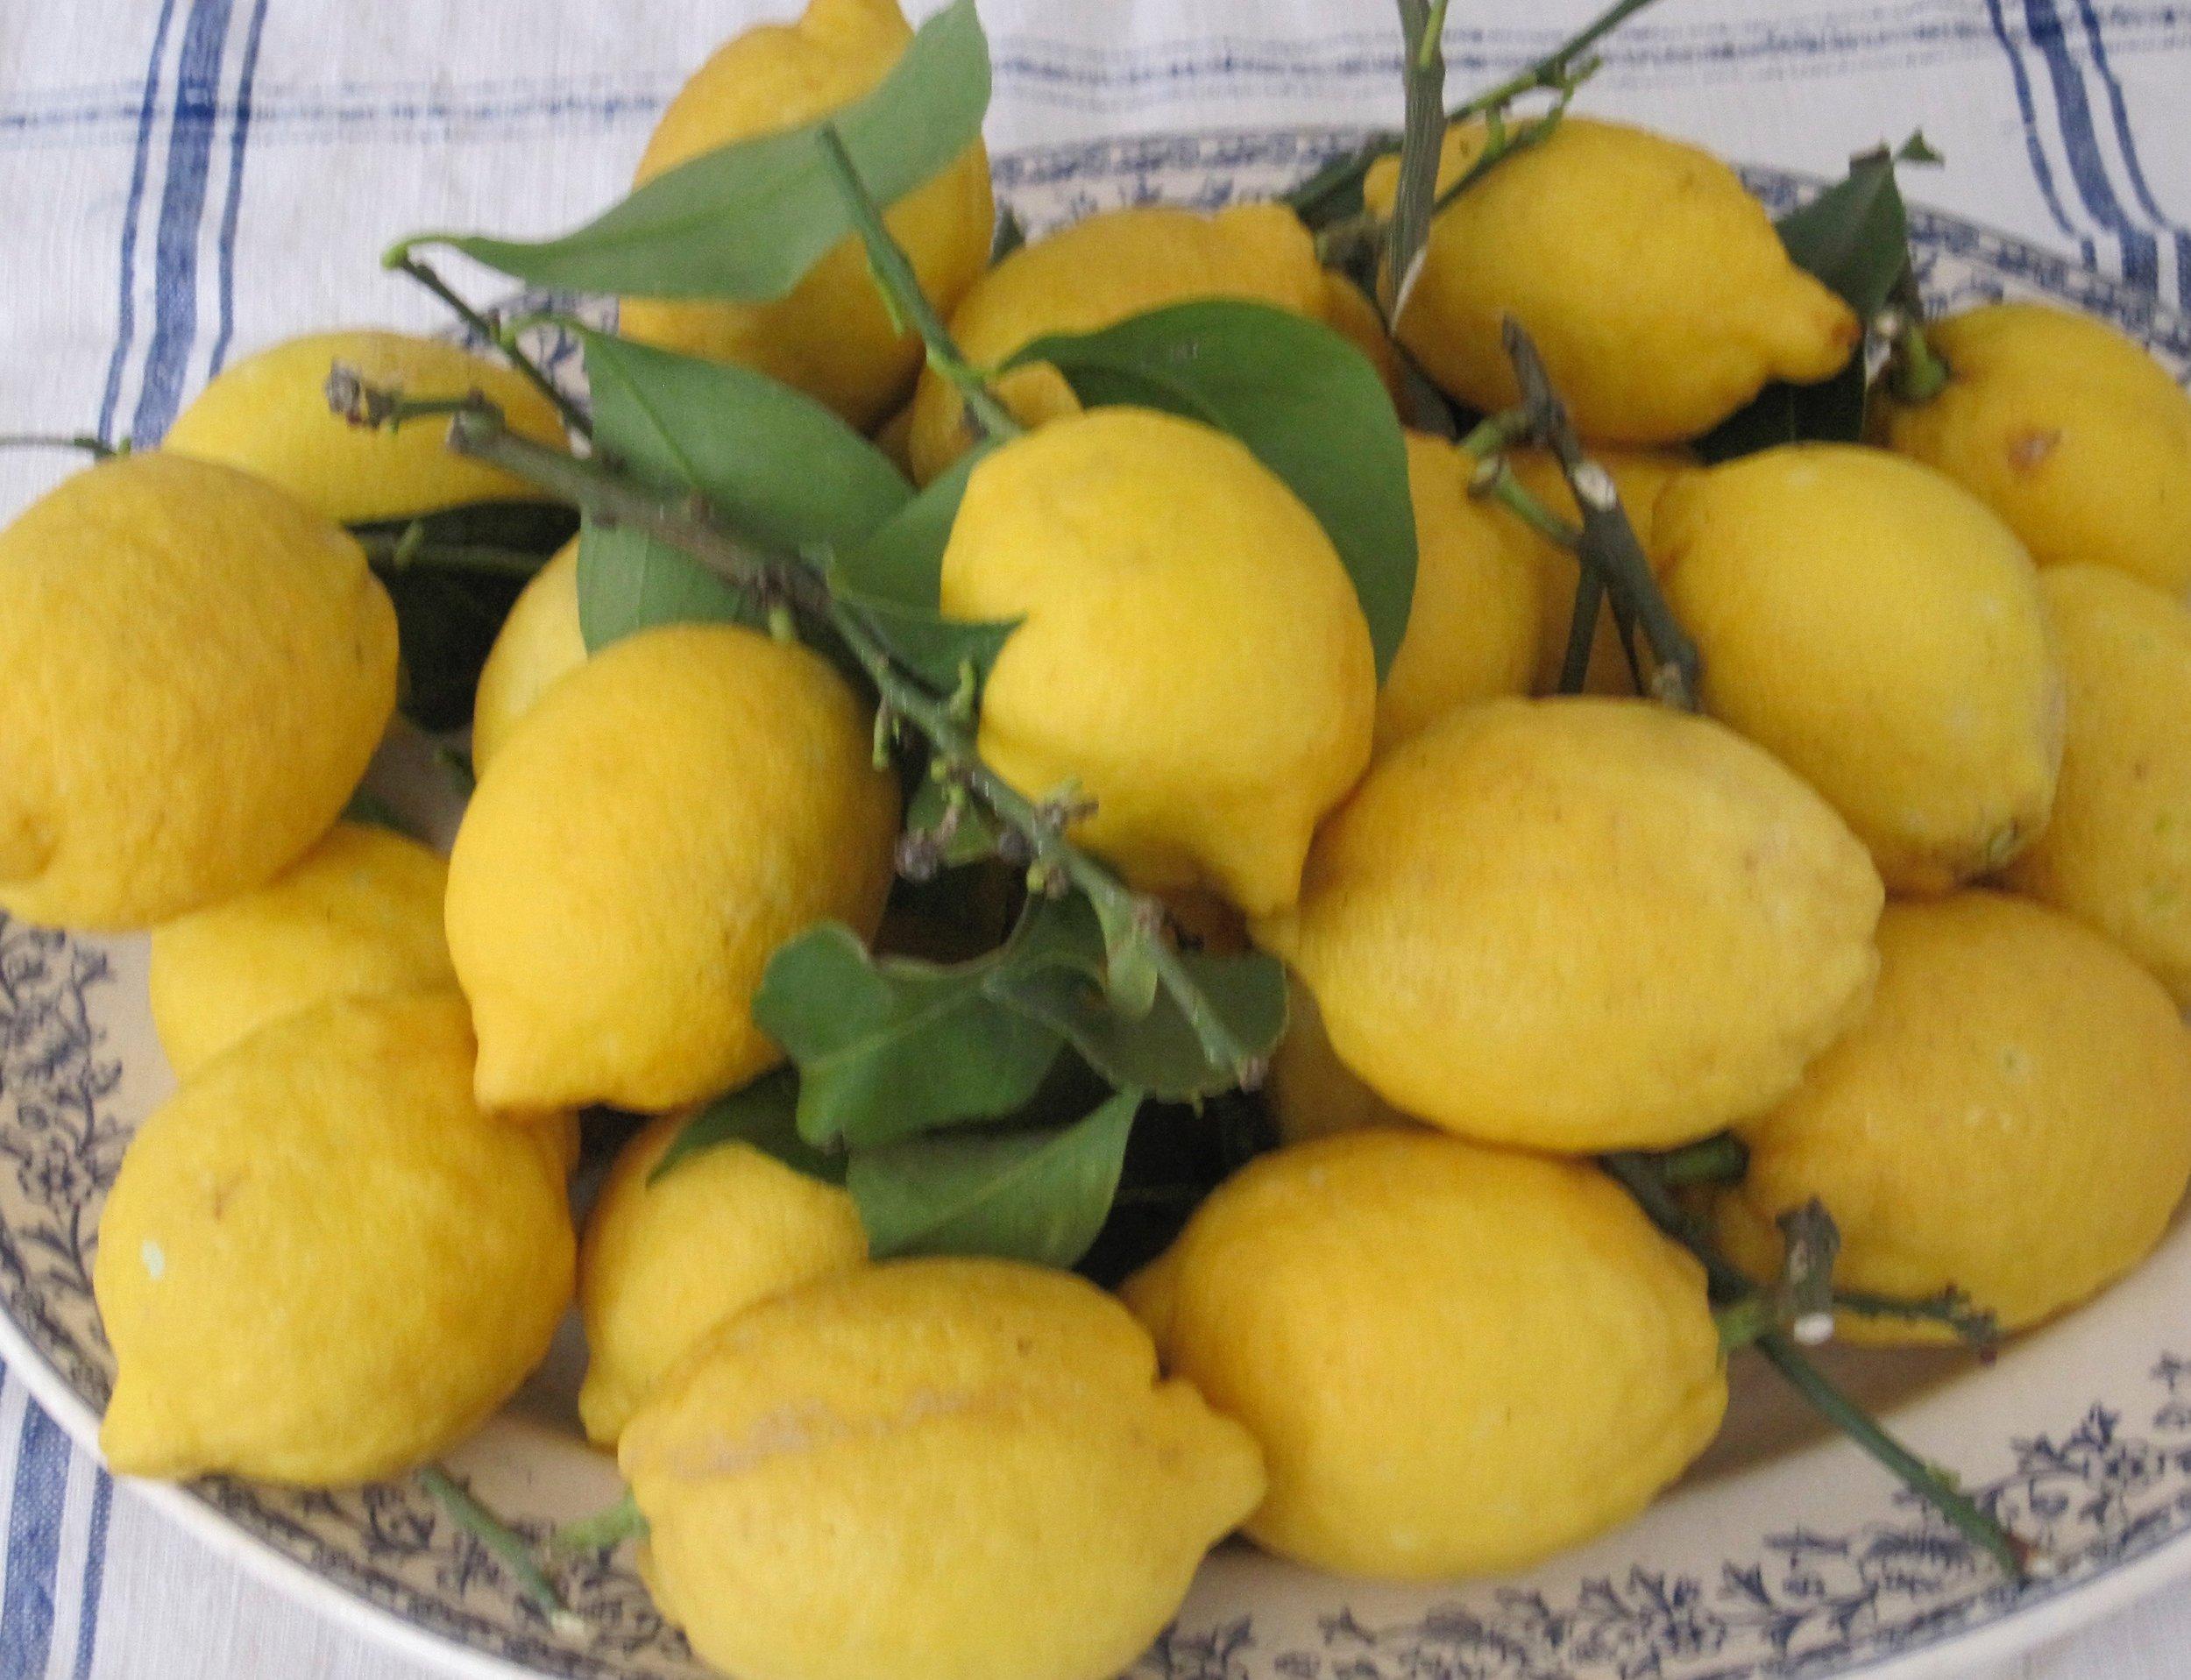 home-grown Eureka lemons